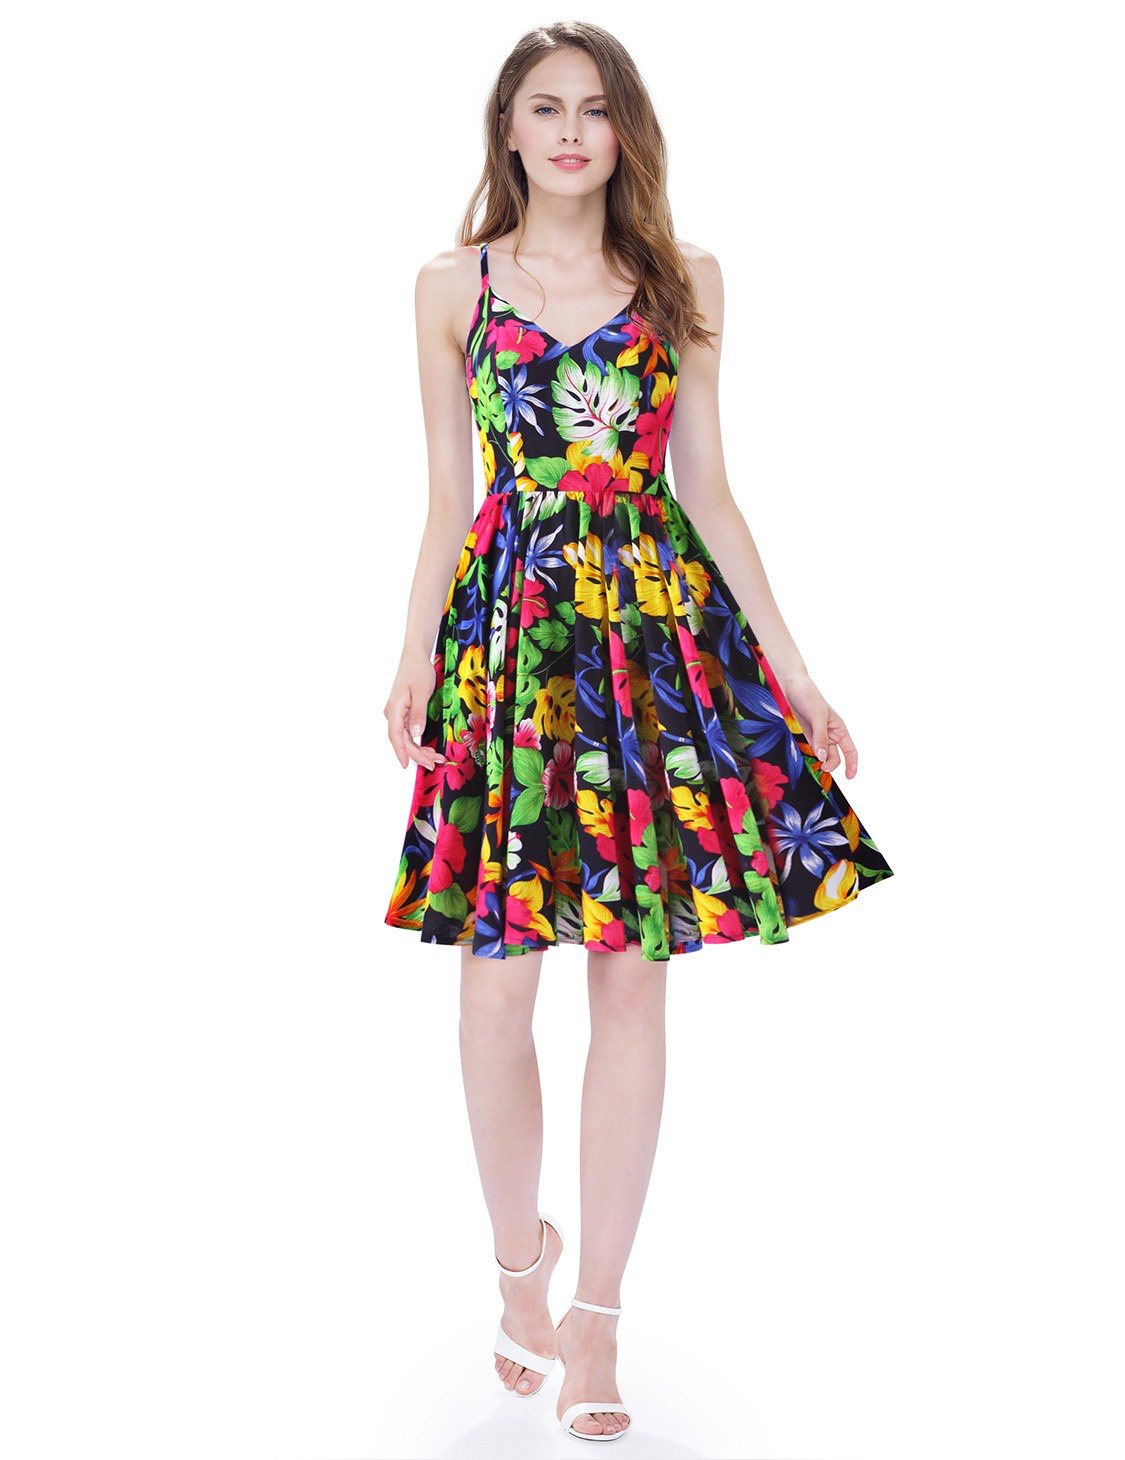 colorful printed sun dress